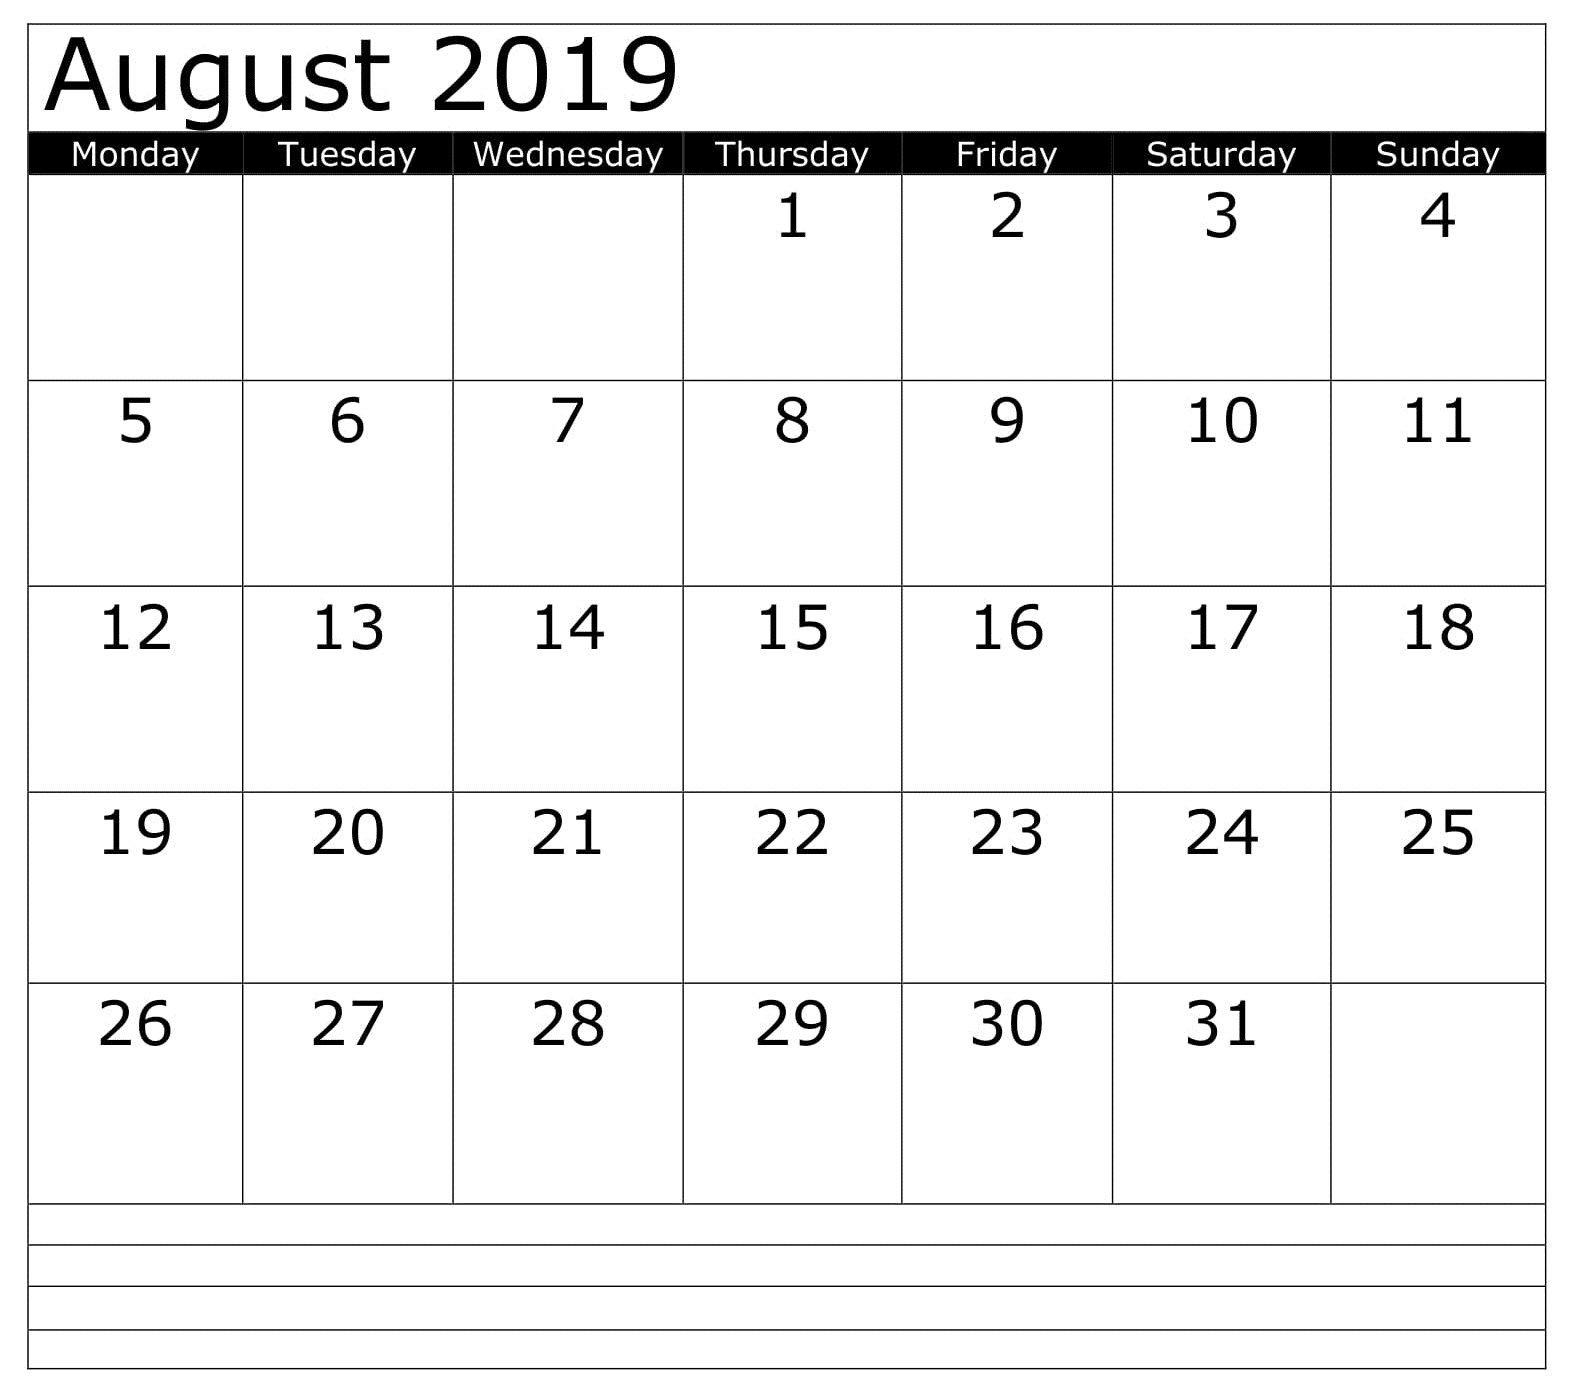 August Blank 2019 Business Calendar In 2019 | Monthly Blank Sunday Through Saturday Calendar